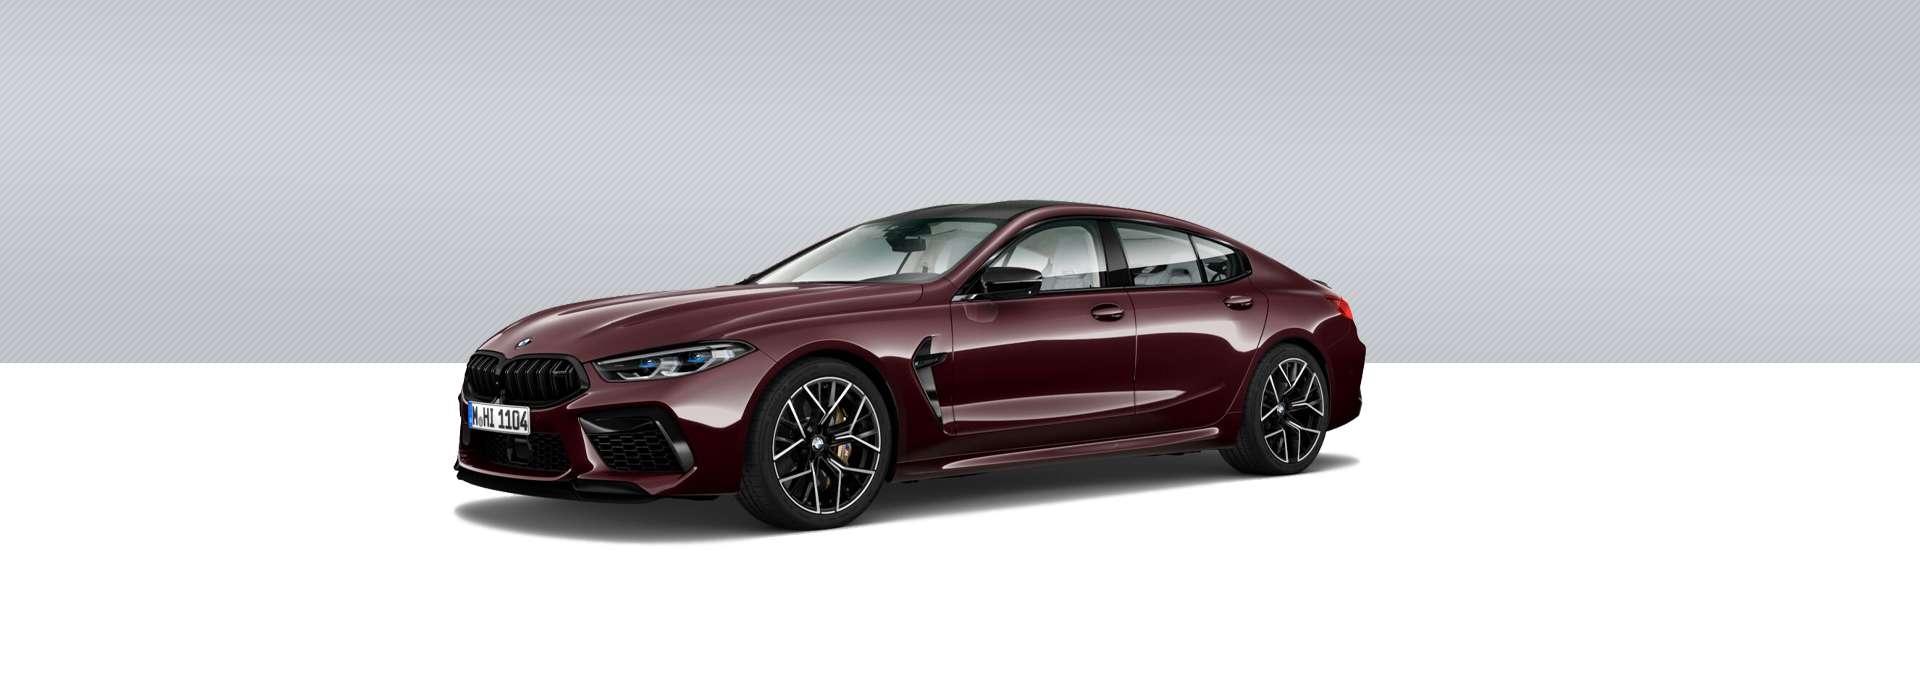 BMW Nuevo M8 Gran Coupé